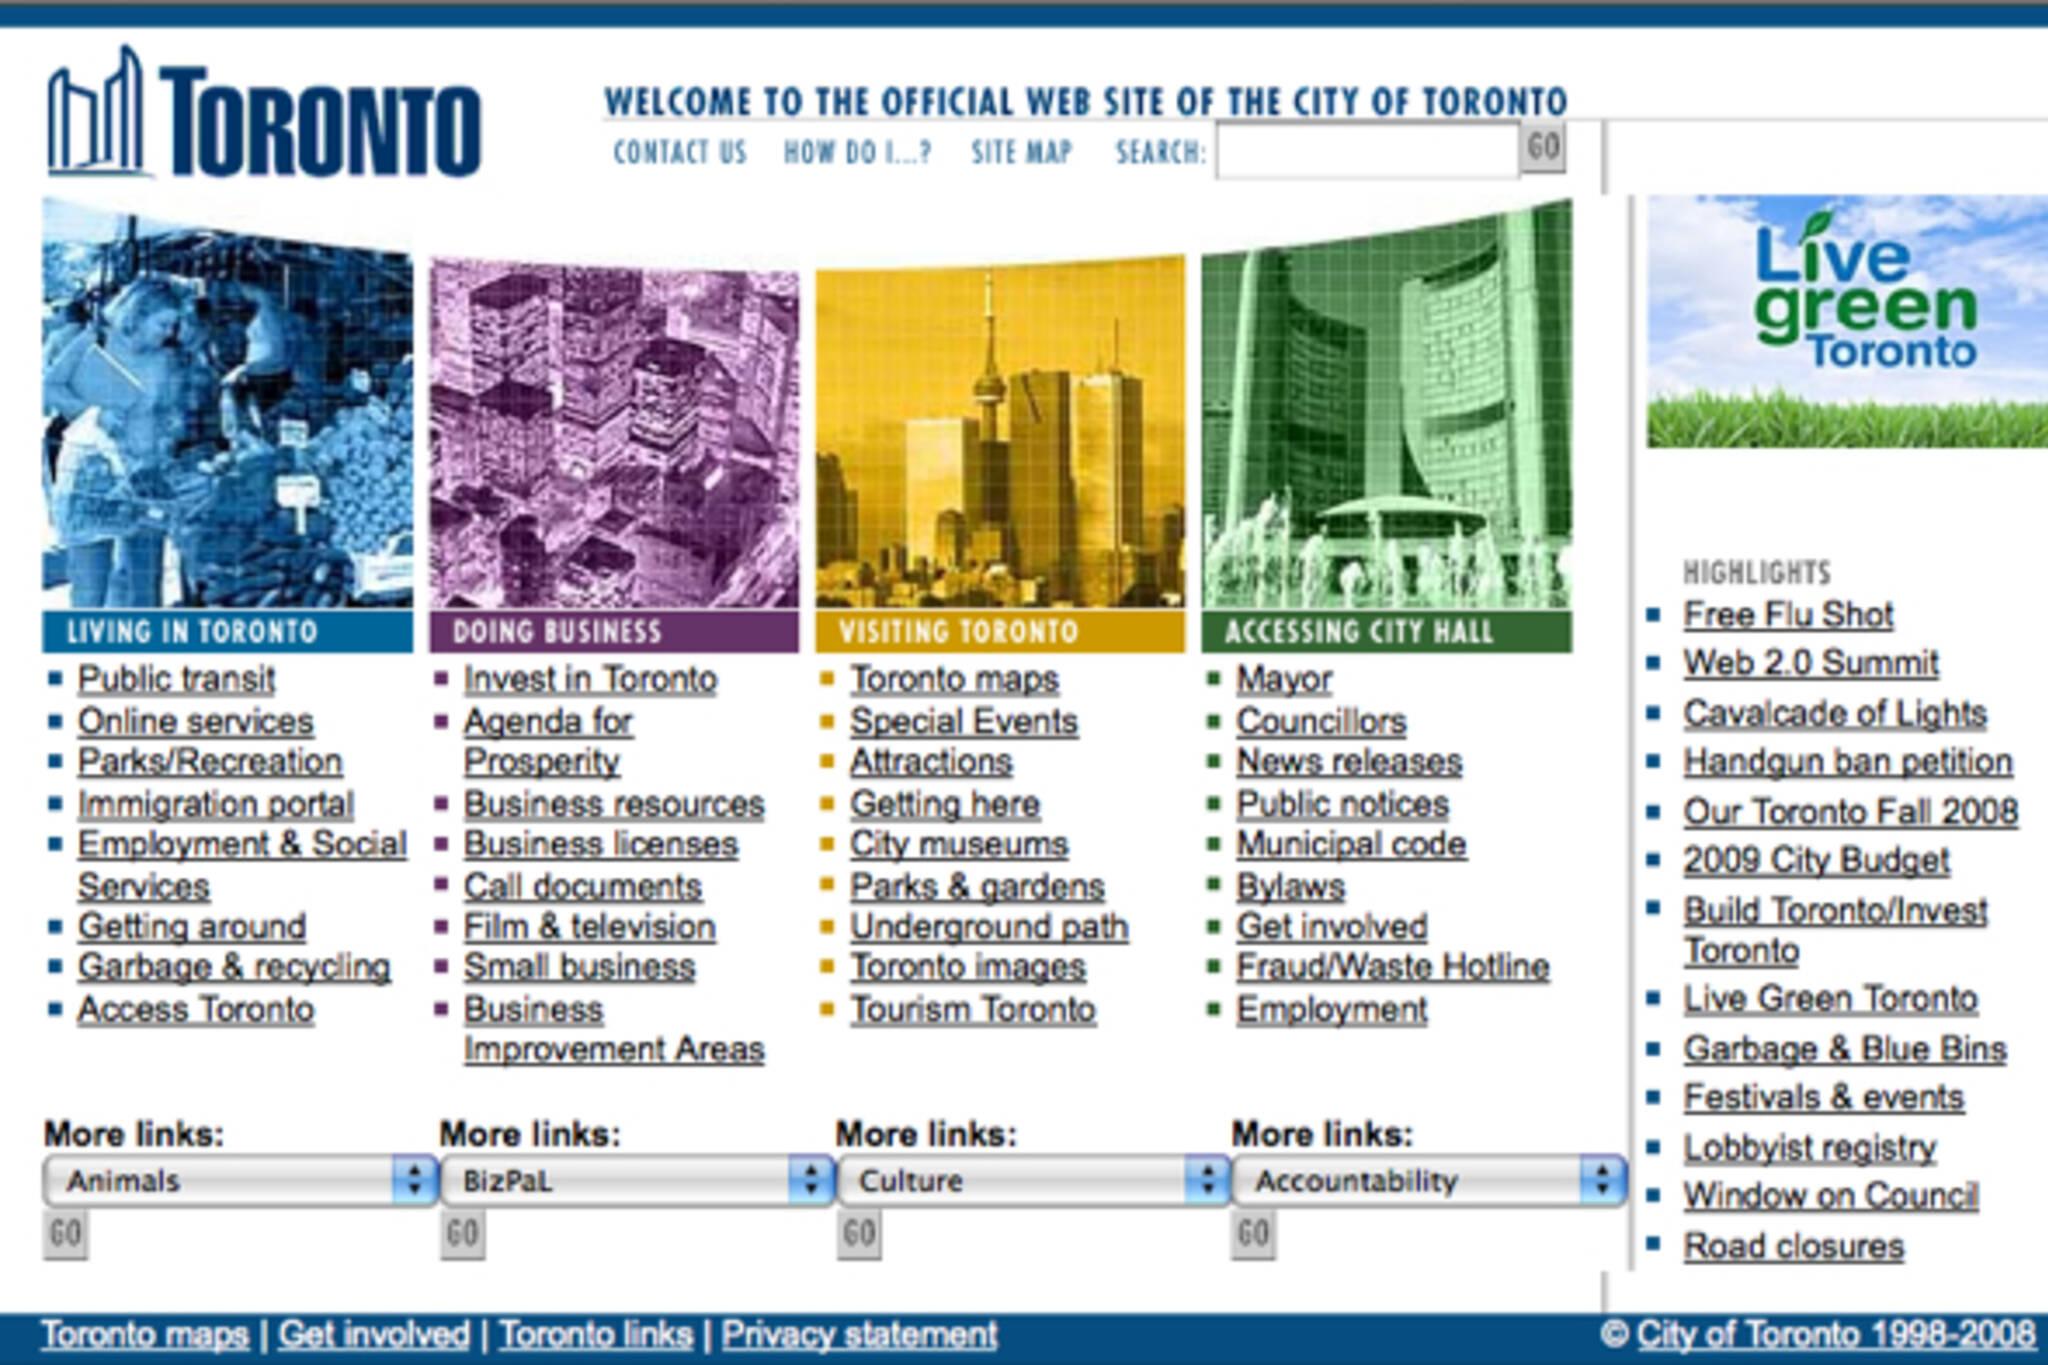 City of Toronto Web 2.0 Summit